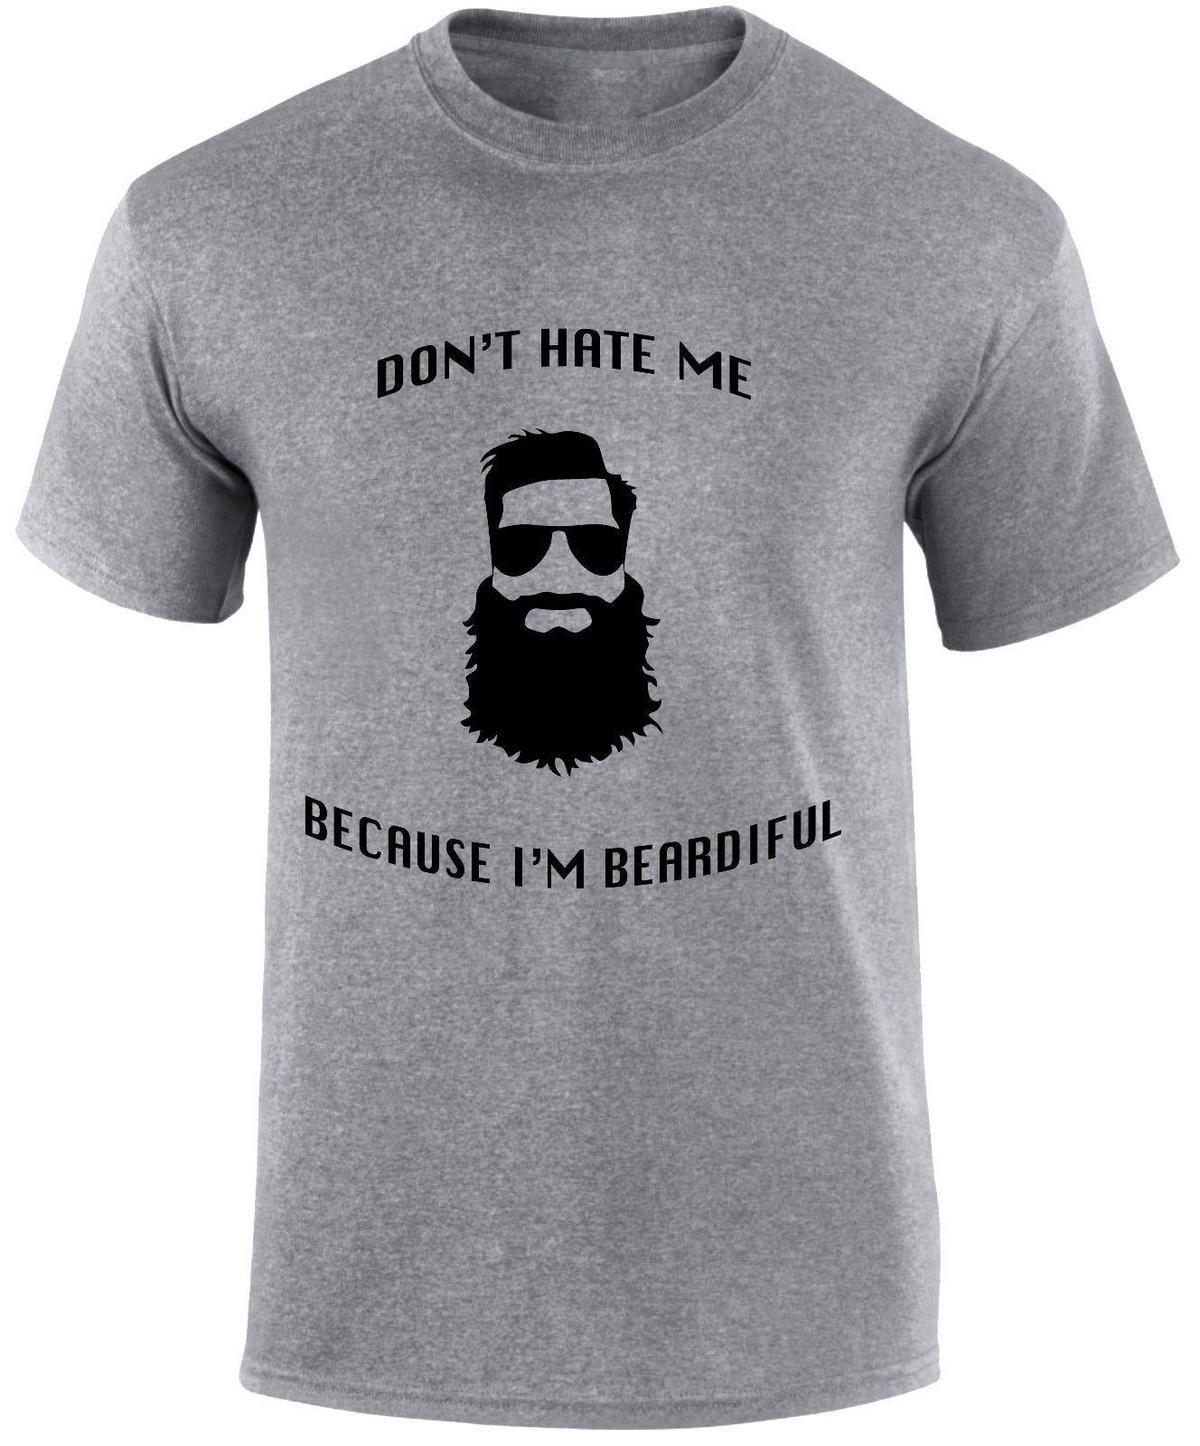 9da033073 Don't Hate Me Because I'm Beardiful Cool Geek Mustache Funny Slogan T-shirt